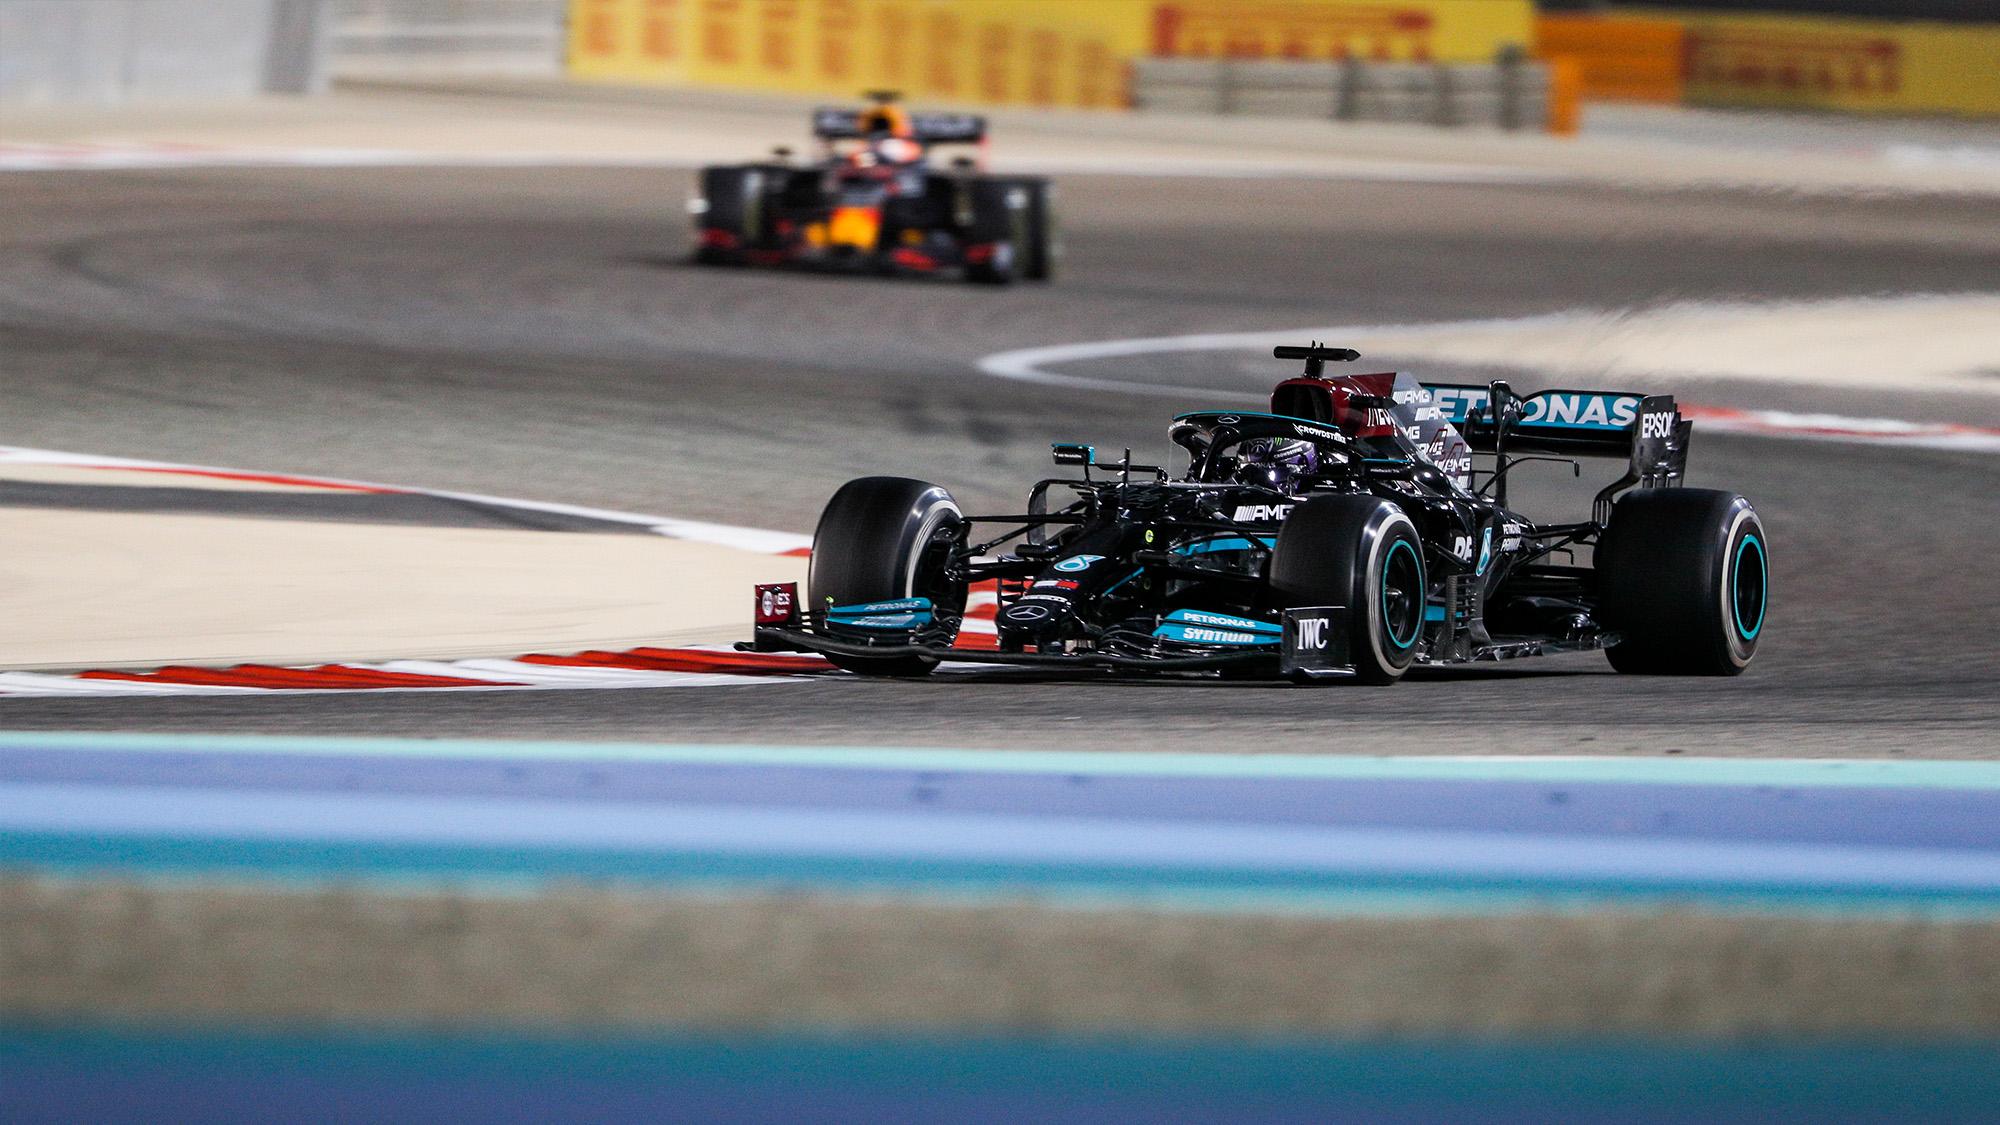 Lewis Hamilton ahead of Max Verstappen in the 2021 Bahrain Grand Prix